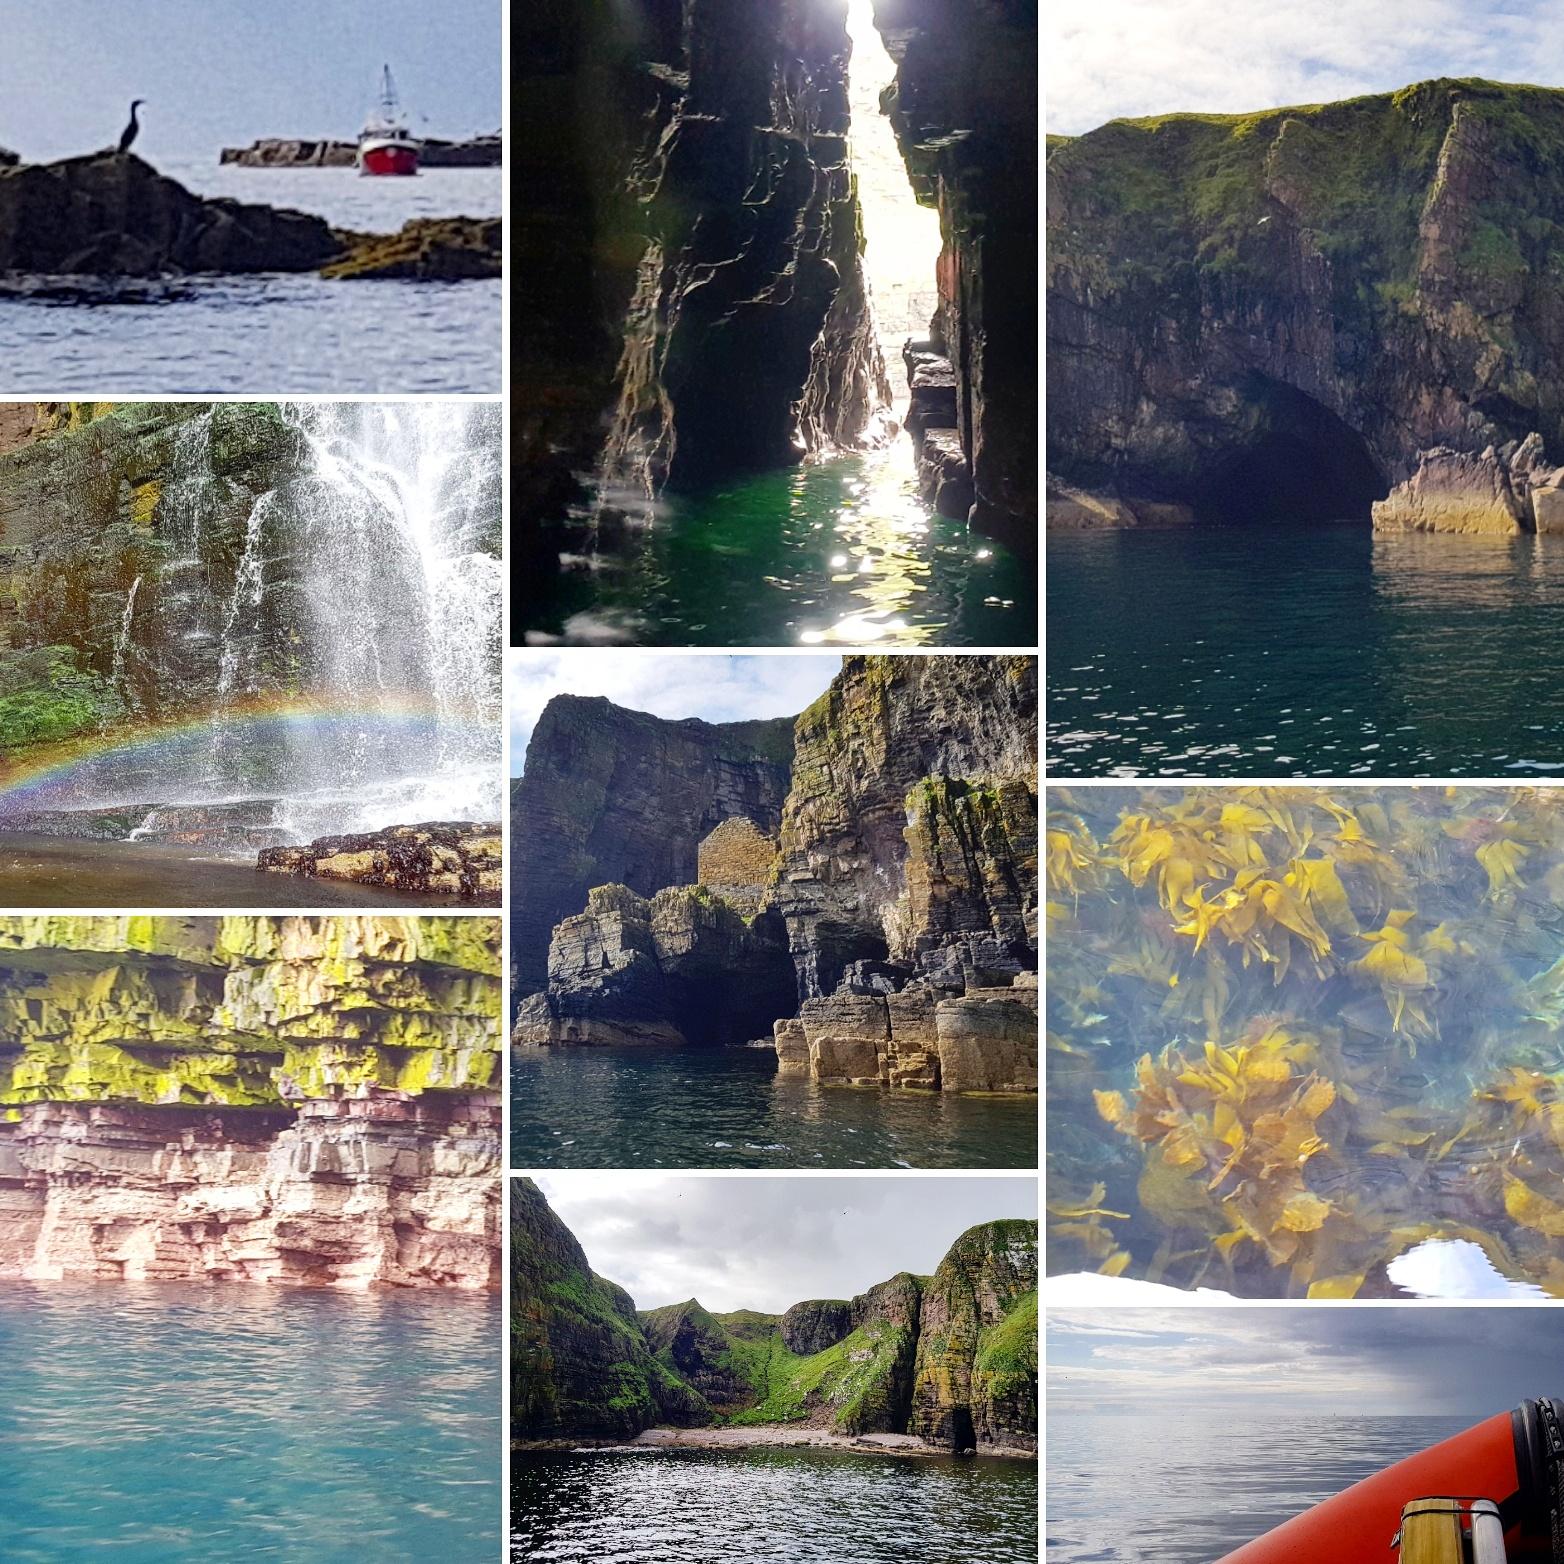 Caithness Seacoast Wick Coast - Fulmars and Scarfies and Seal - The Last Krystallos